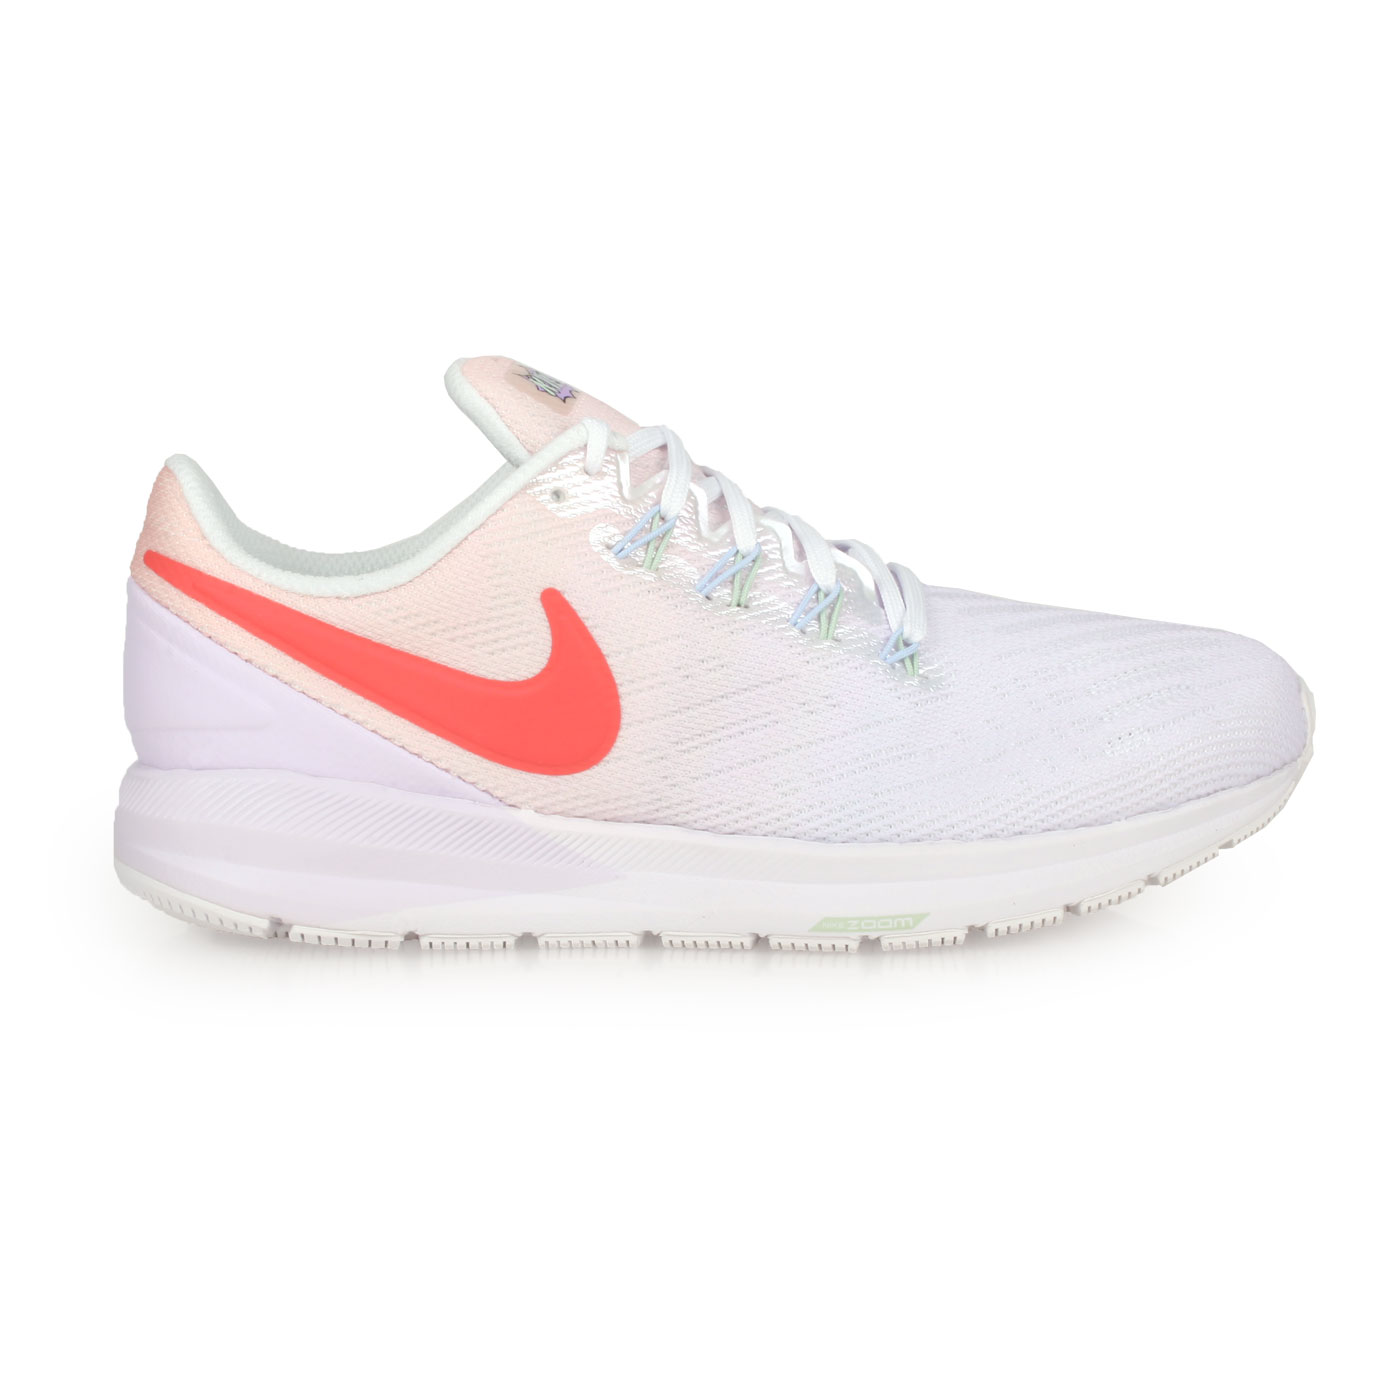 NIKE 女款慢跑鞋  @W AIR ZOOM STRUCTURE 22@CW2640681 - 淺紫白橘紅